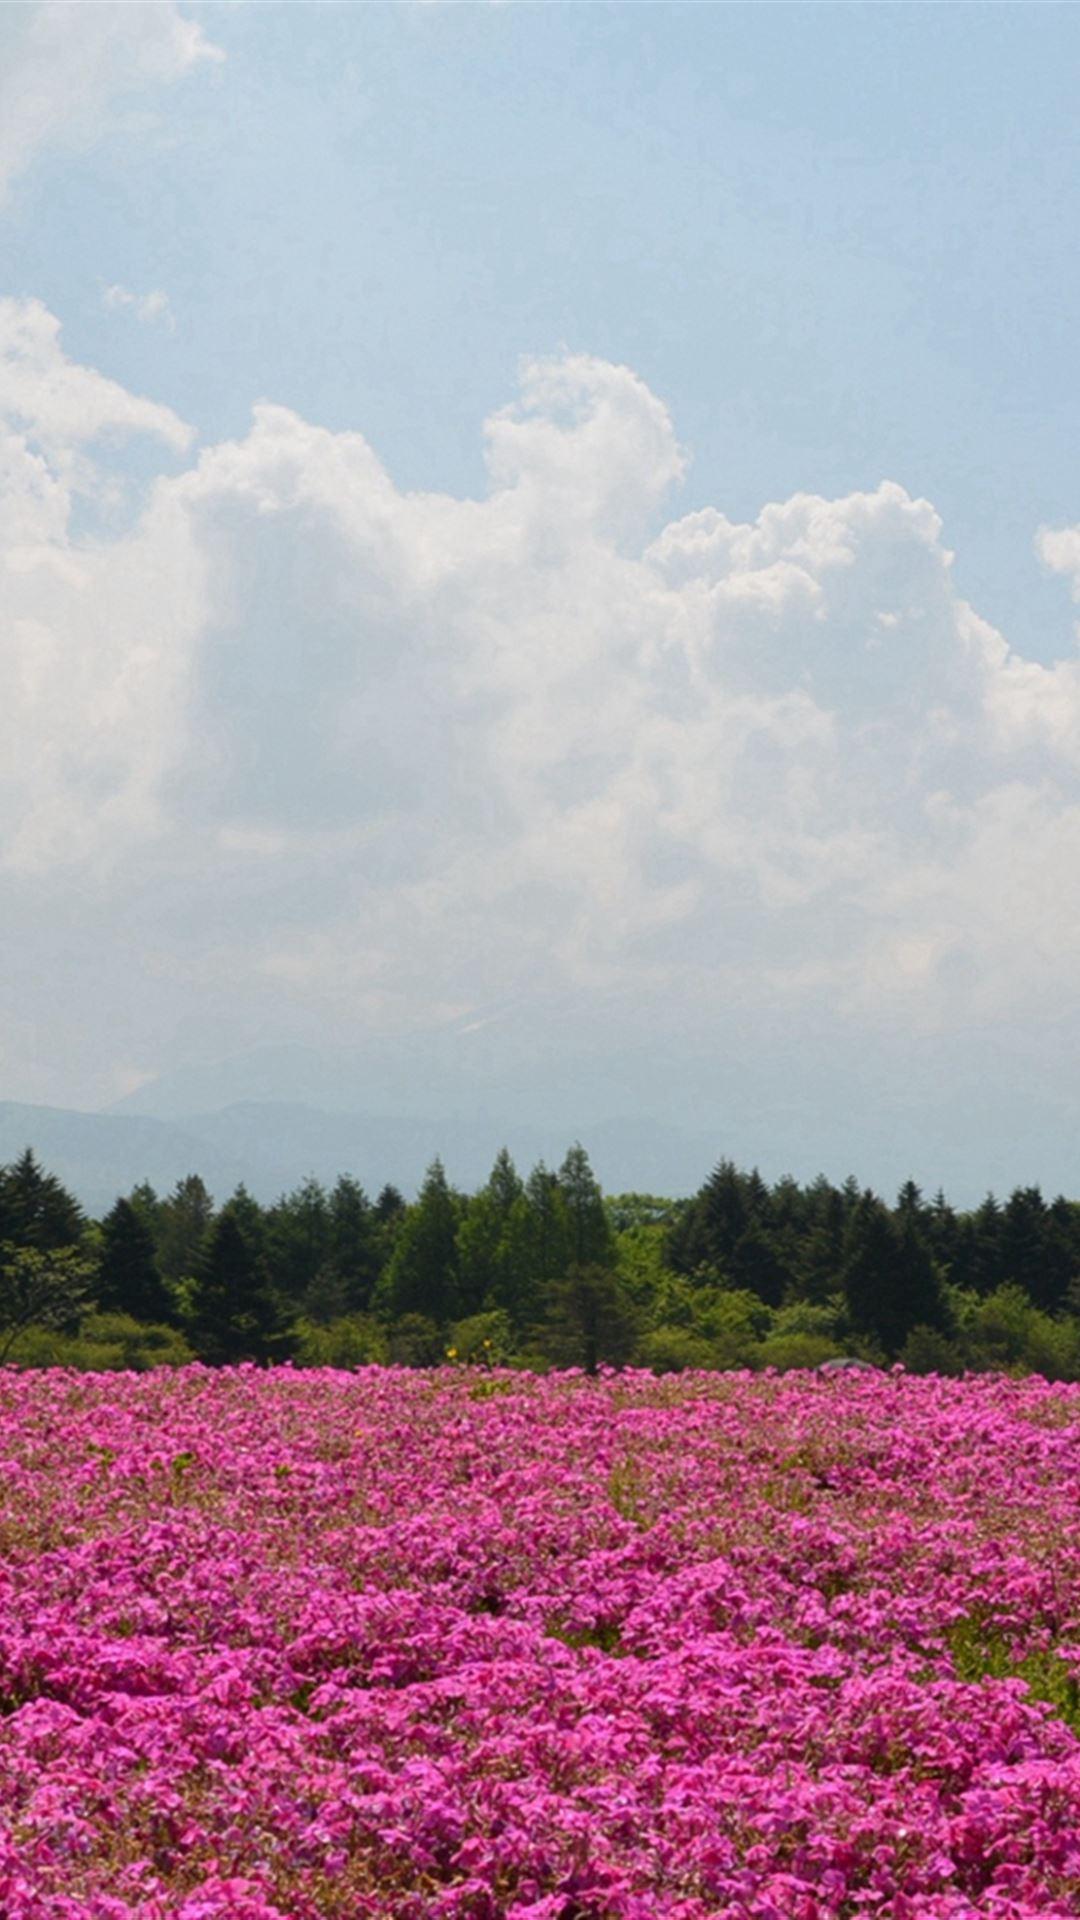 Field Flowers Pink Summer iPhone 4s wallpaper